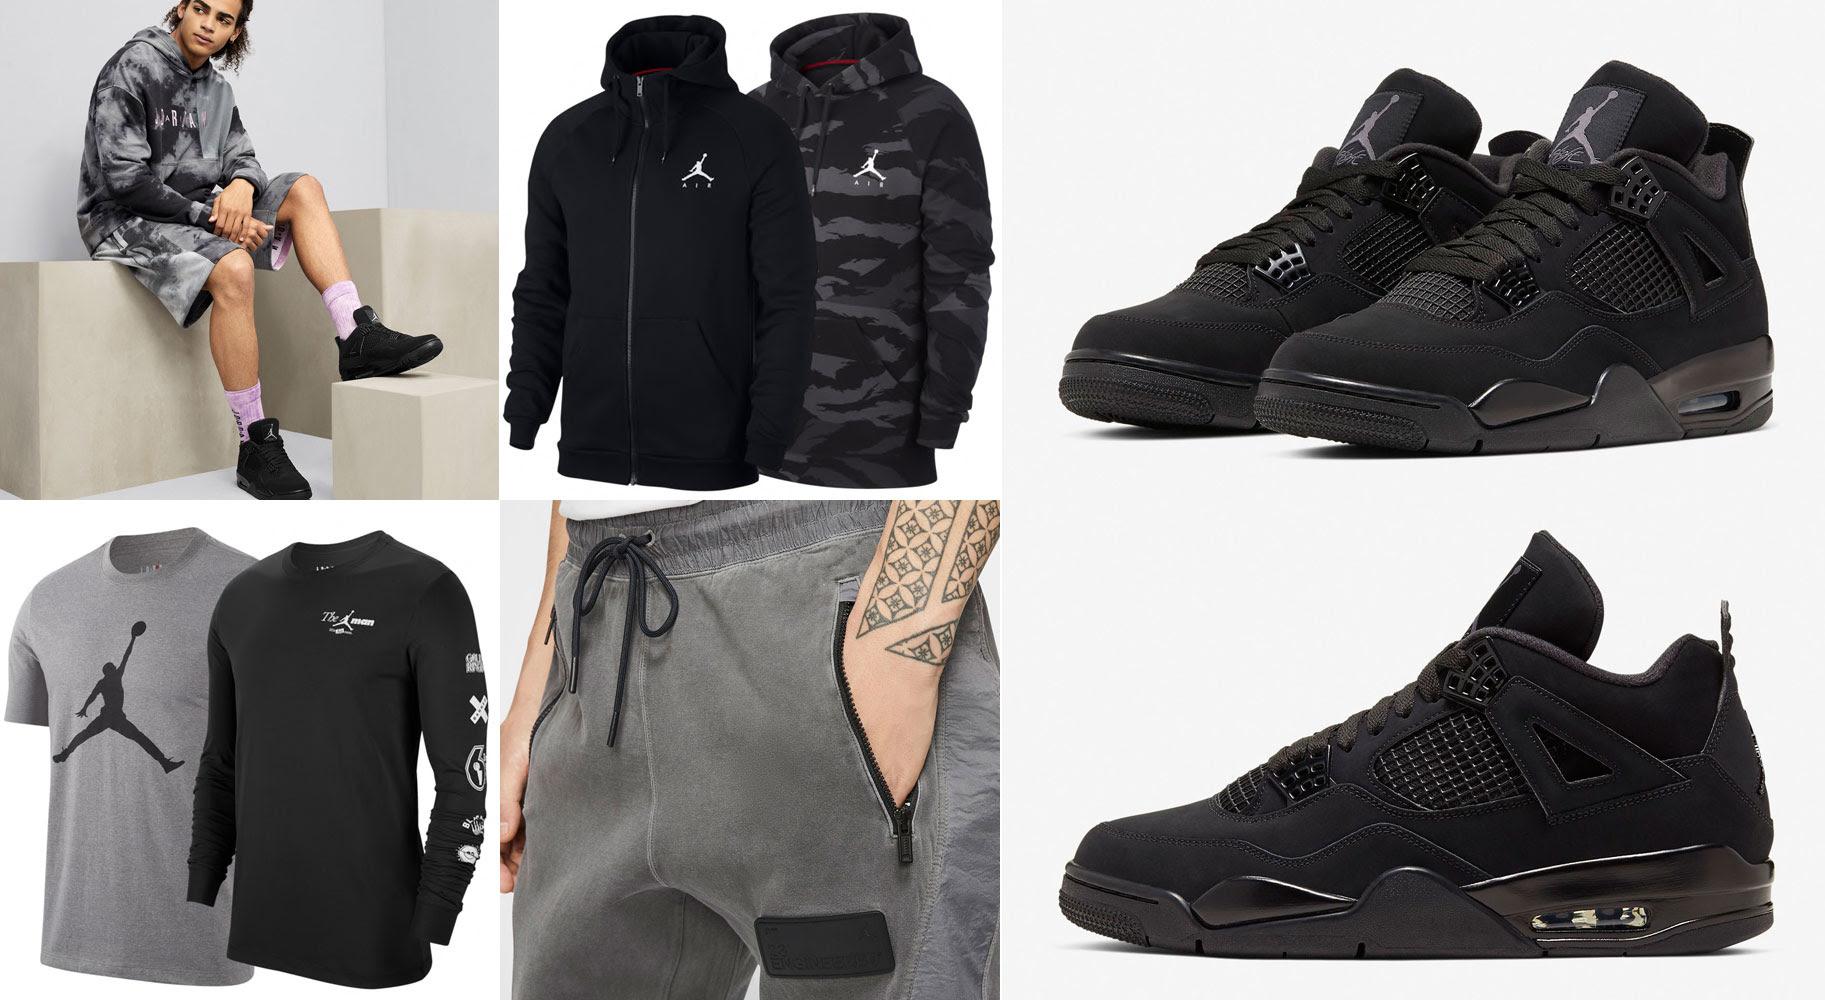 Air Jordan 30 Black Cat Outfits to Match  SneakerFits.com